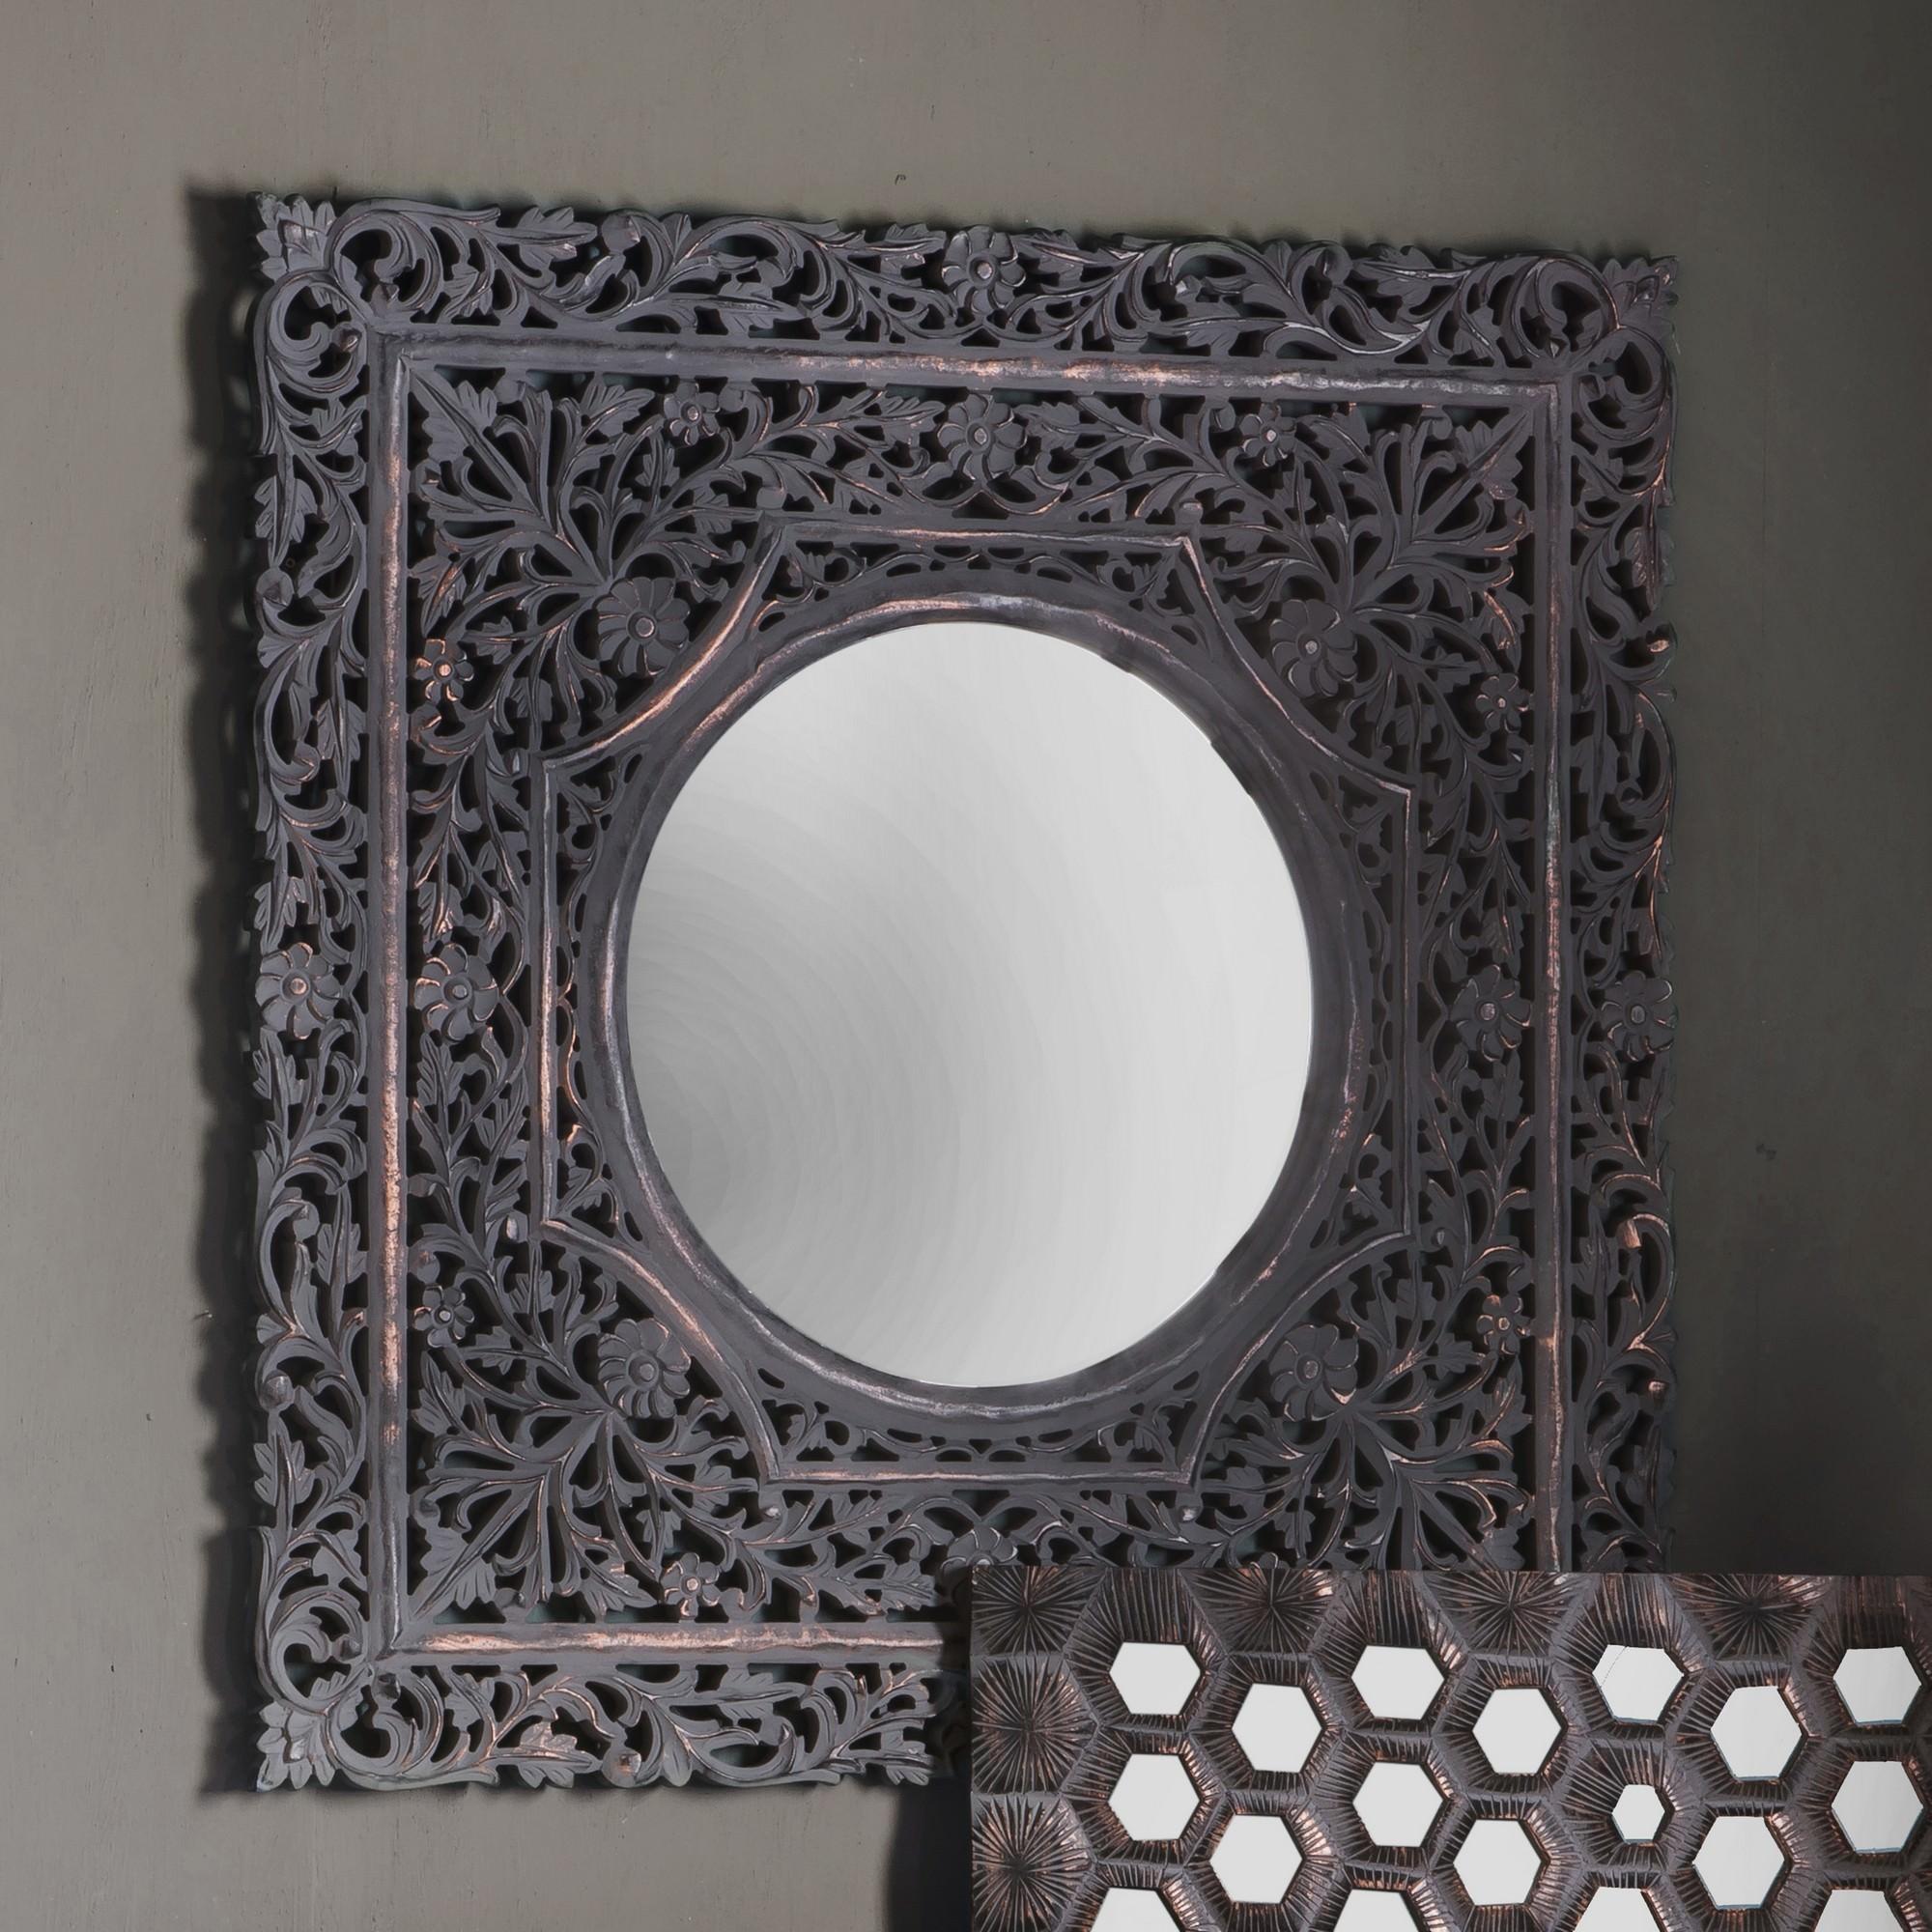 Koya Square Wall Mirror, 120cm